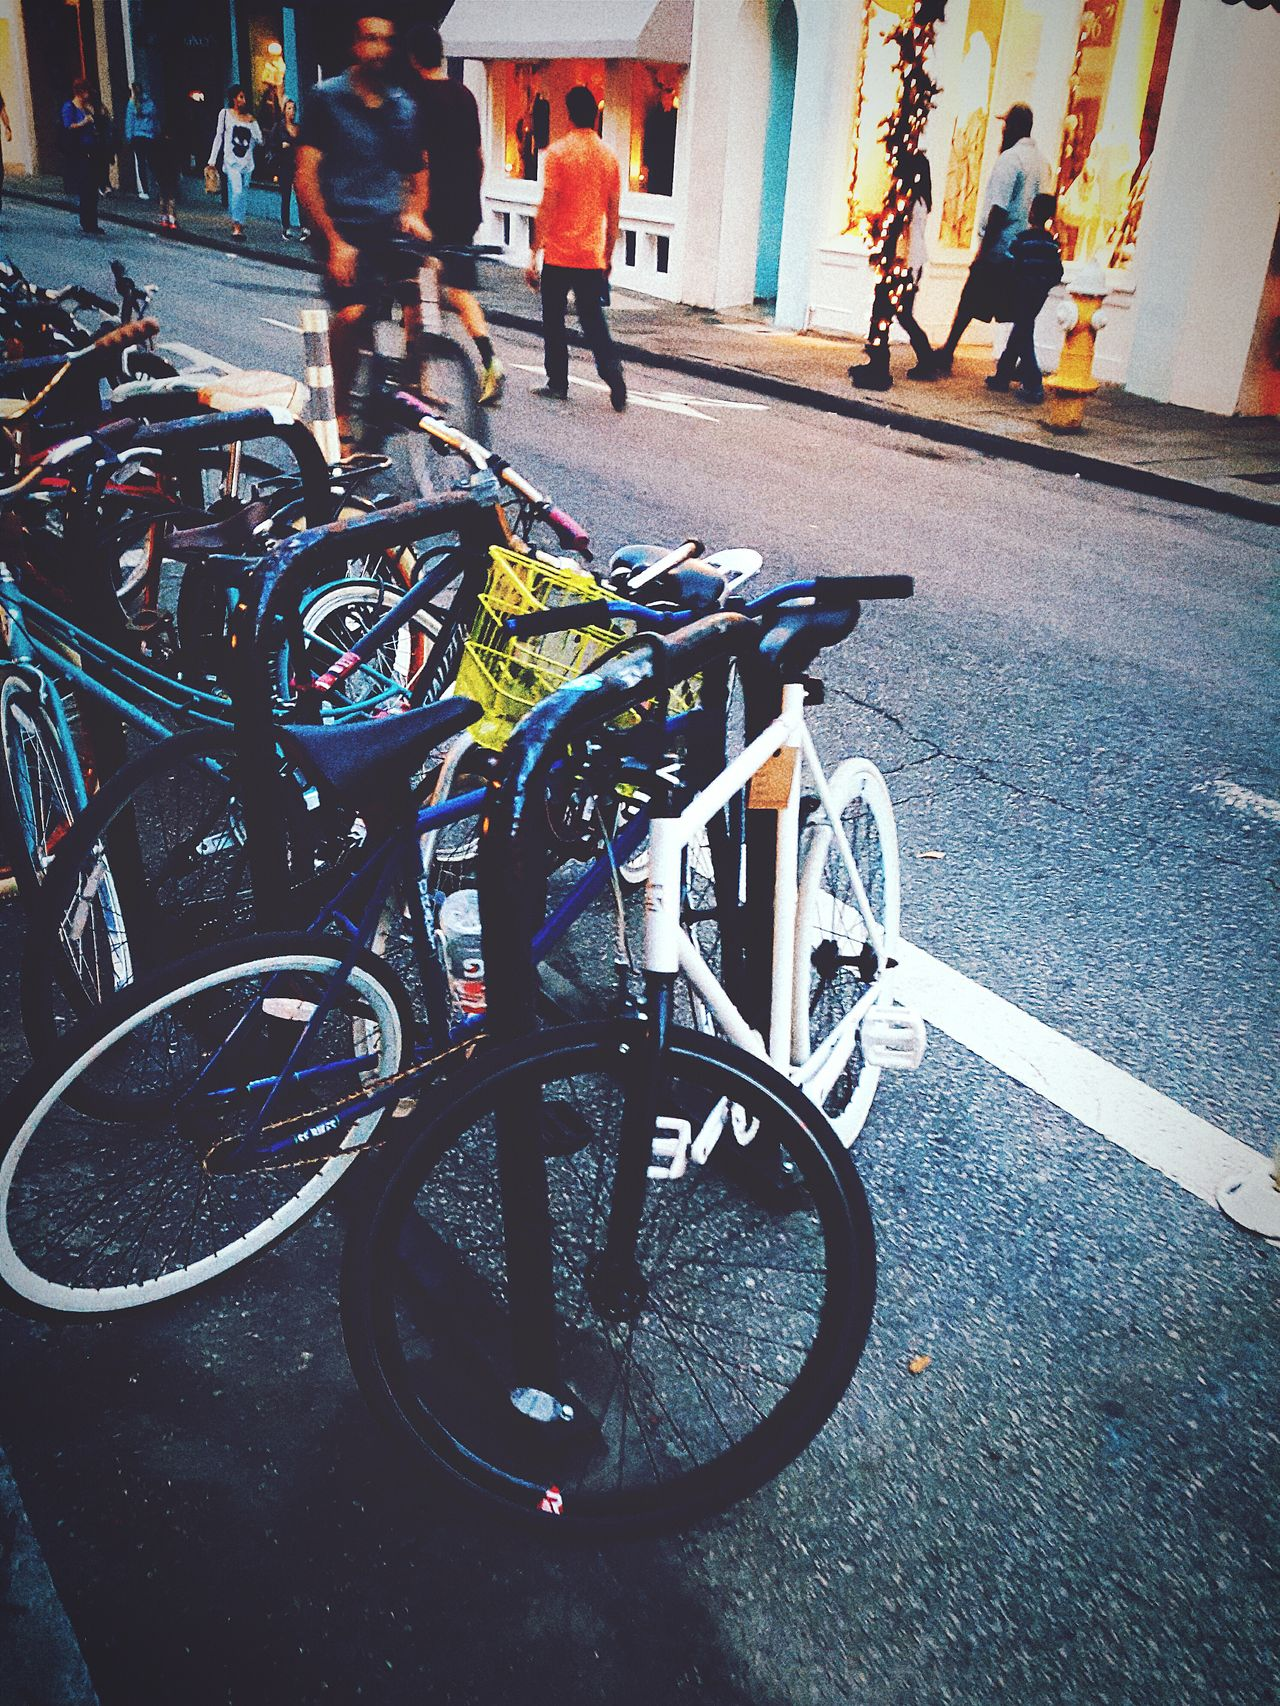 Walking Around Andrography Urbanphotography Photodroid  Bike The Street Photographer - 2016 EyeEm Awards